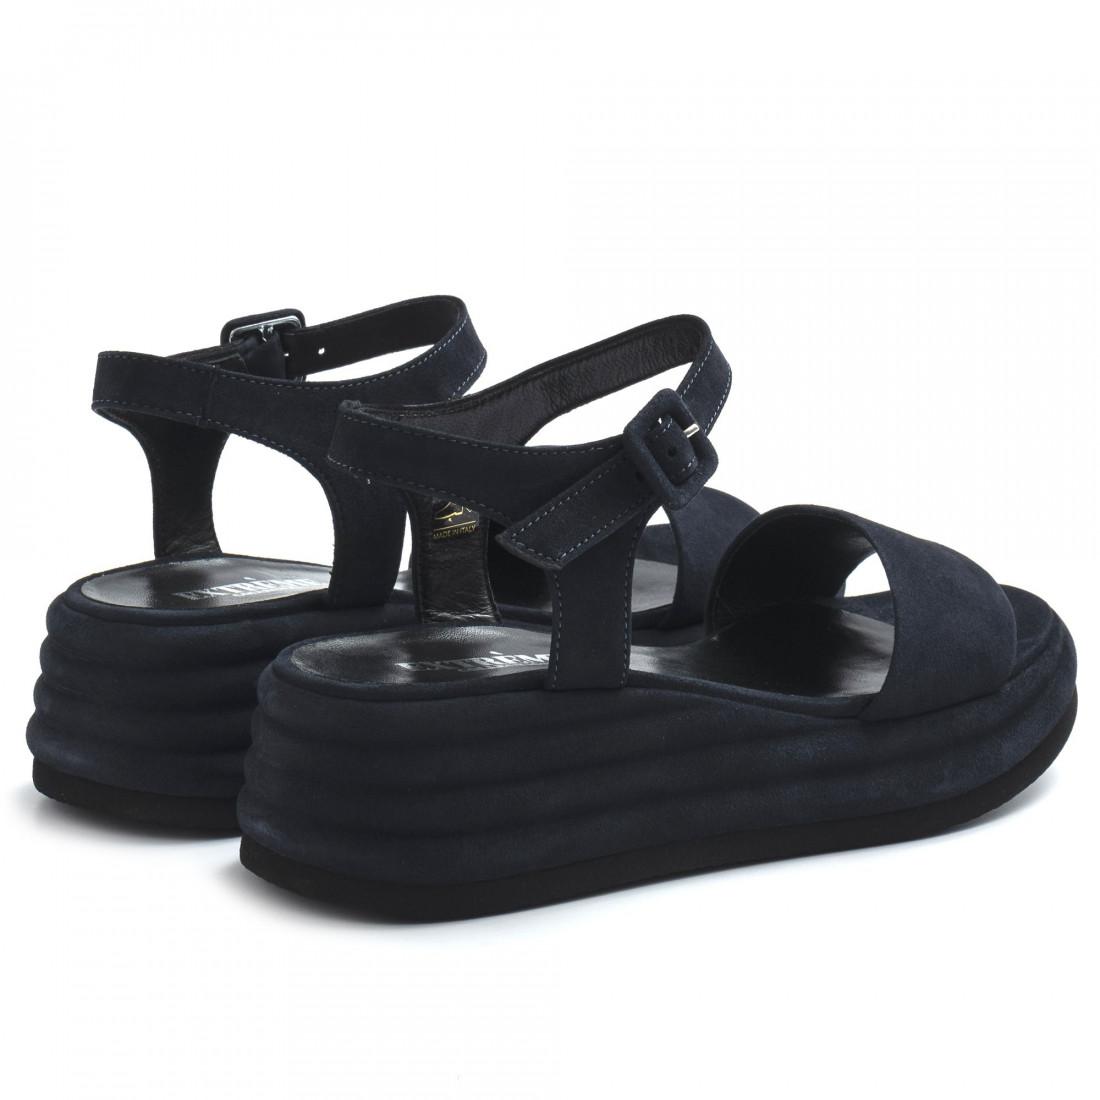 sandalen damen extreme 2662jancamoscio navy 8586